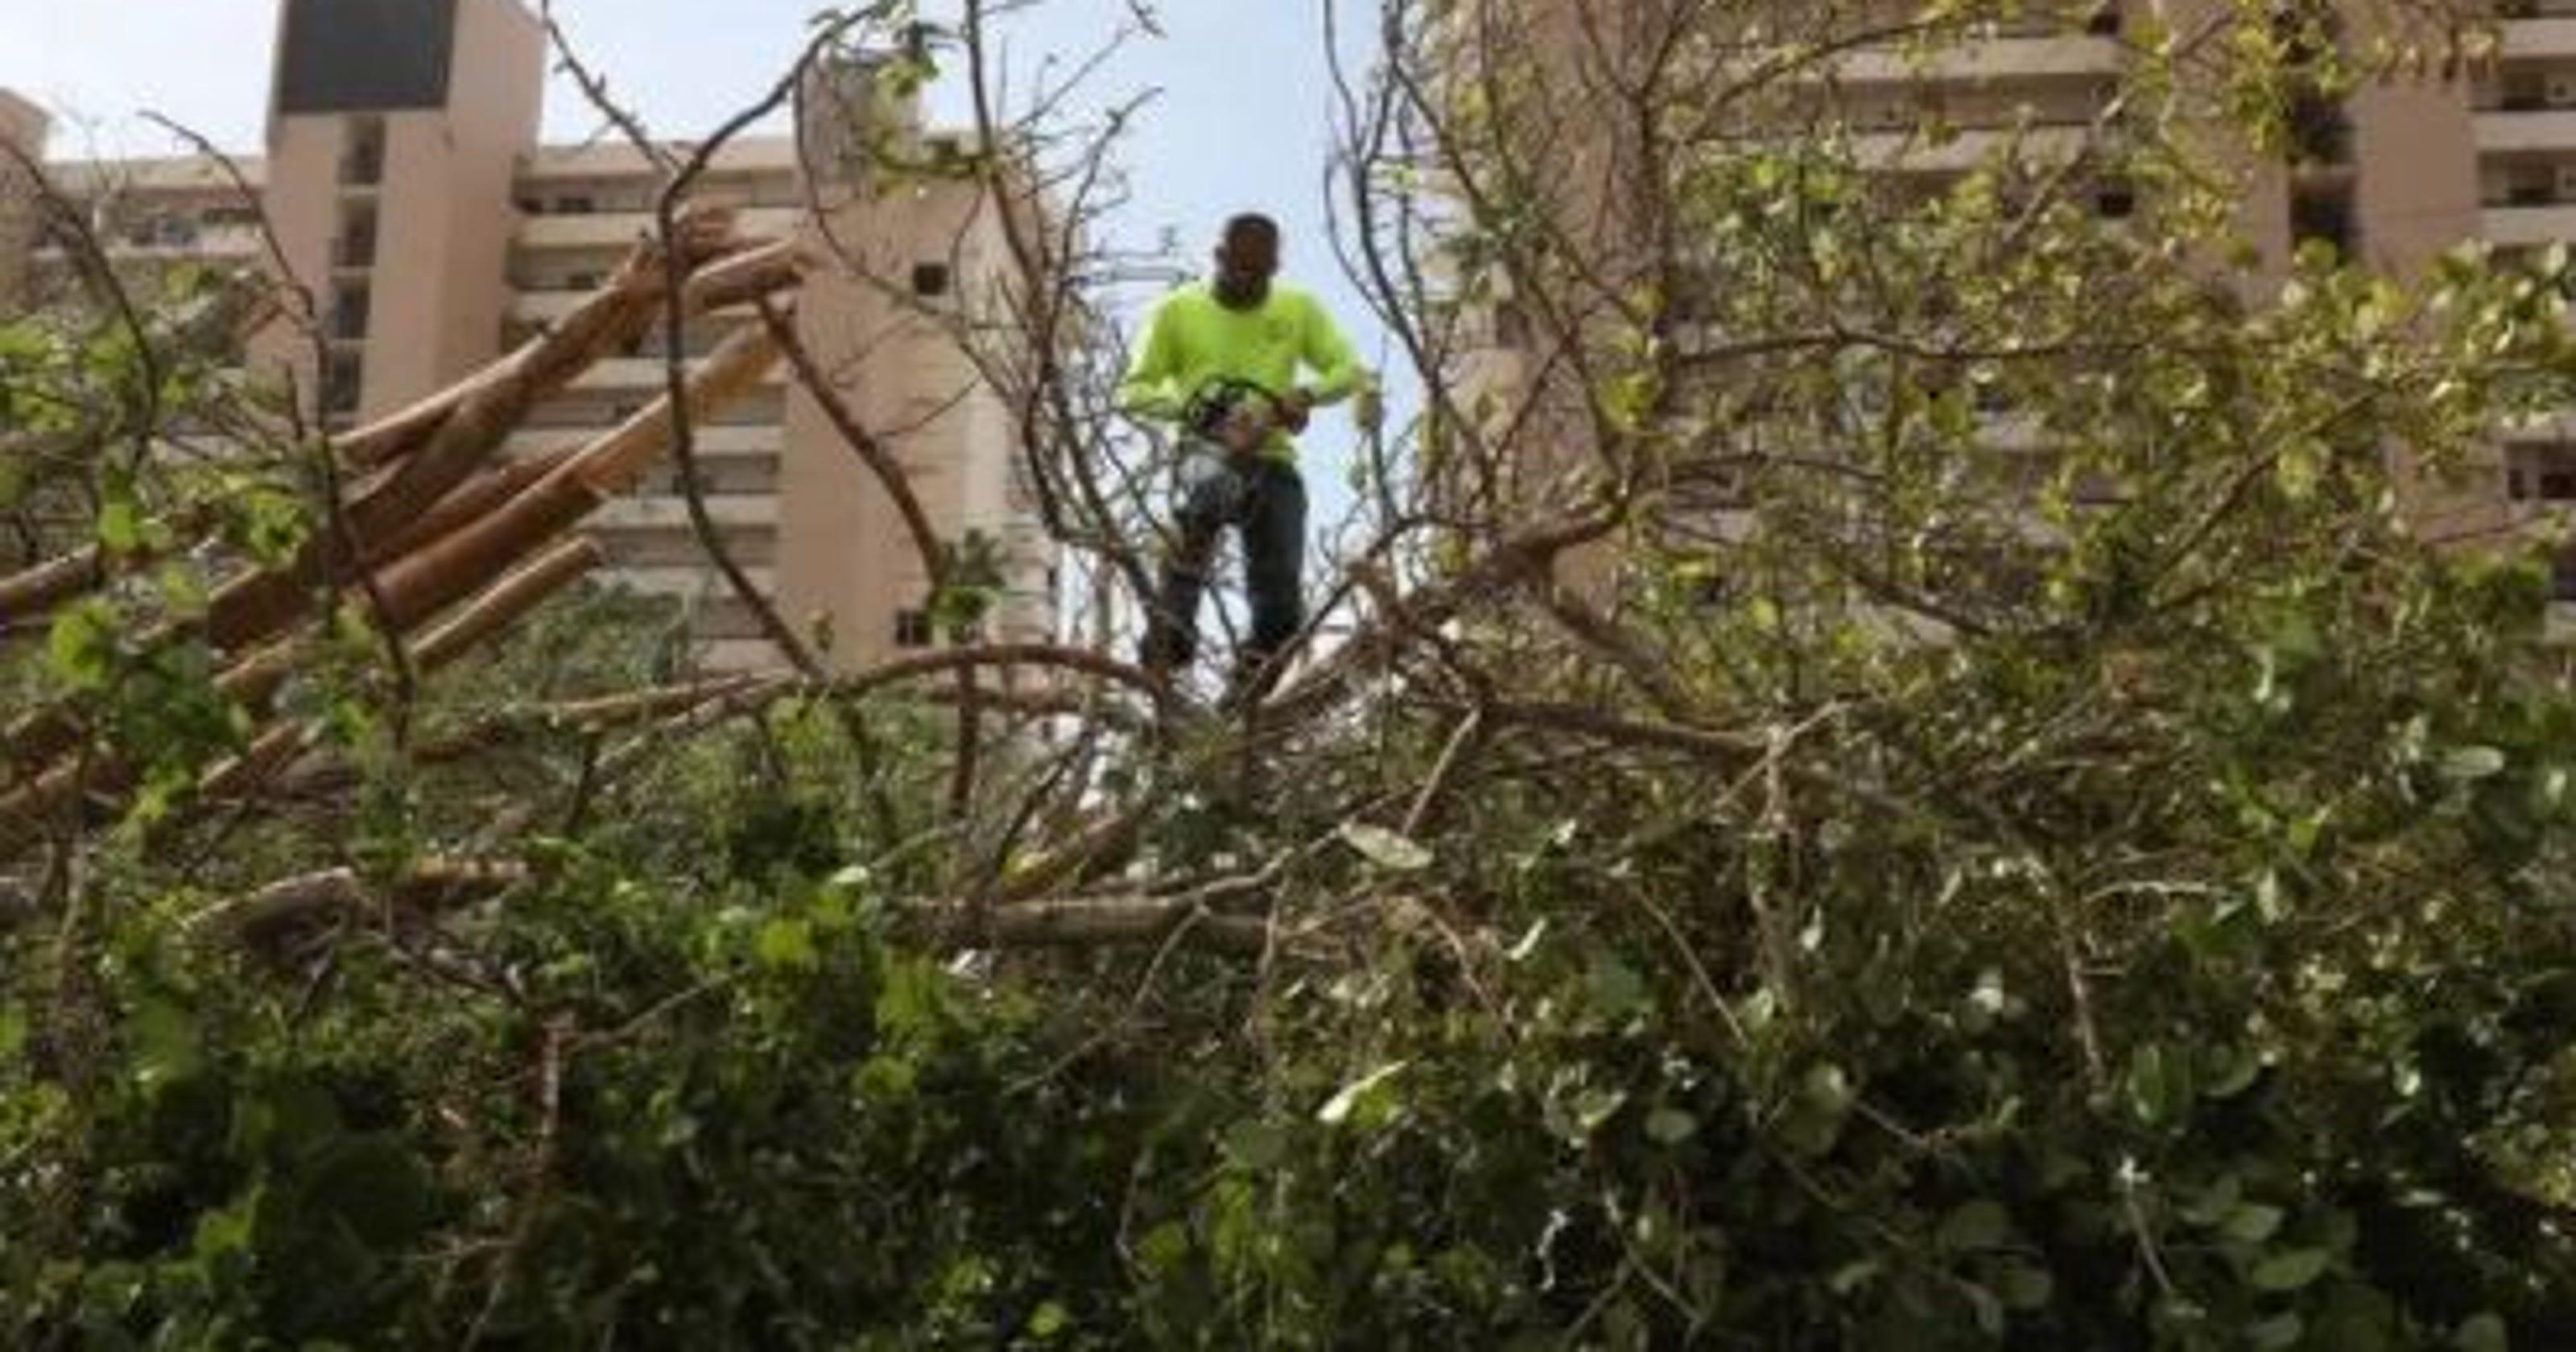 Second Hurricane Irma debris will cost Lee County $39 million